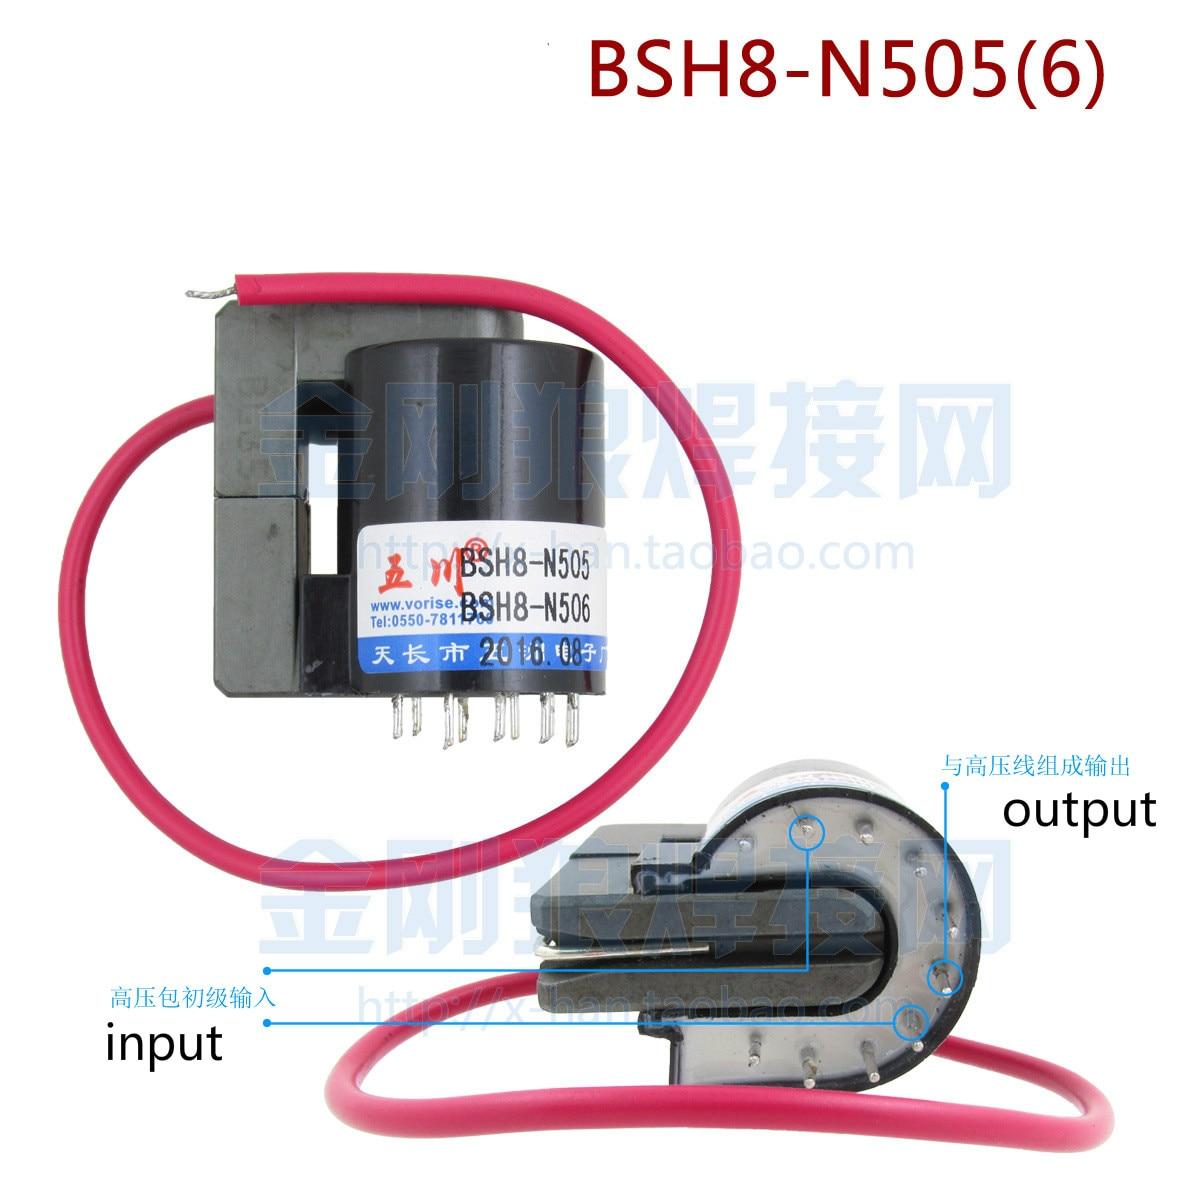 BSH8-N505 BSH8-N506 Special High Pressure Package For Argon Arc Welding Machine 10 Feet